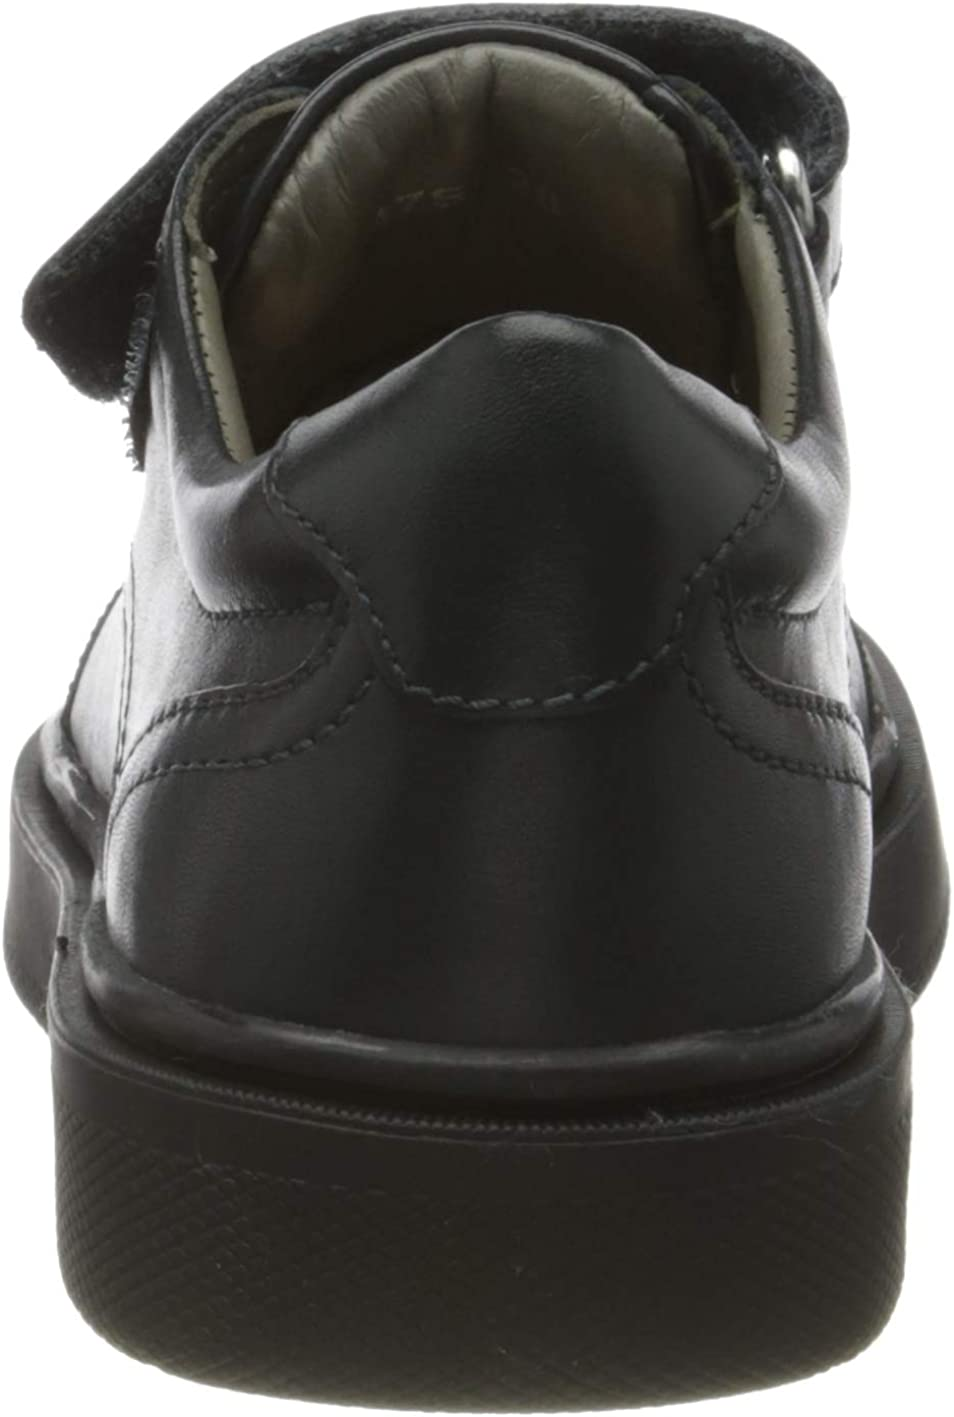 Geox Boys J Riddock School Uniform Shoes